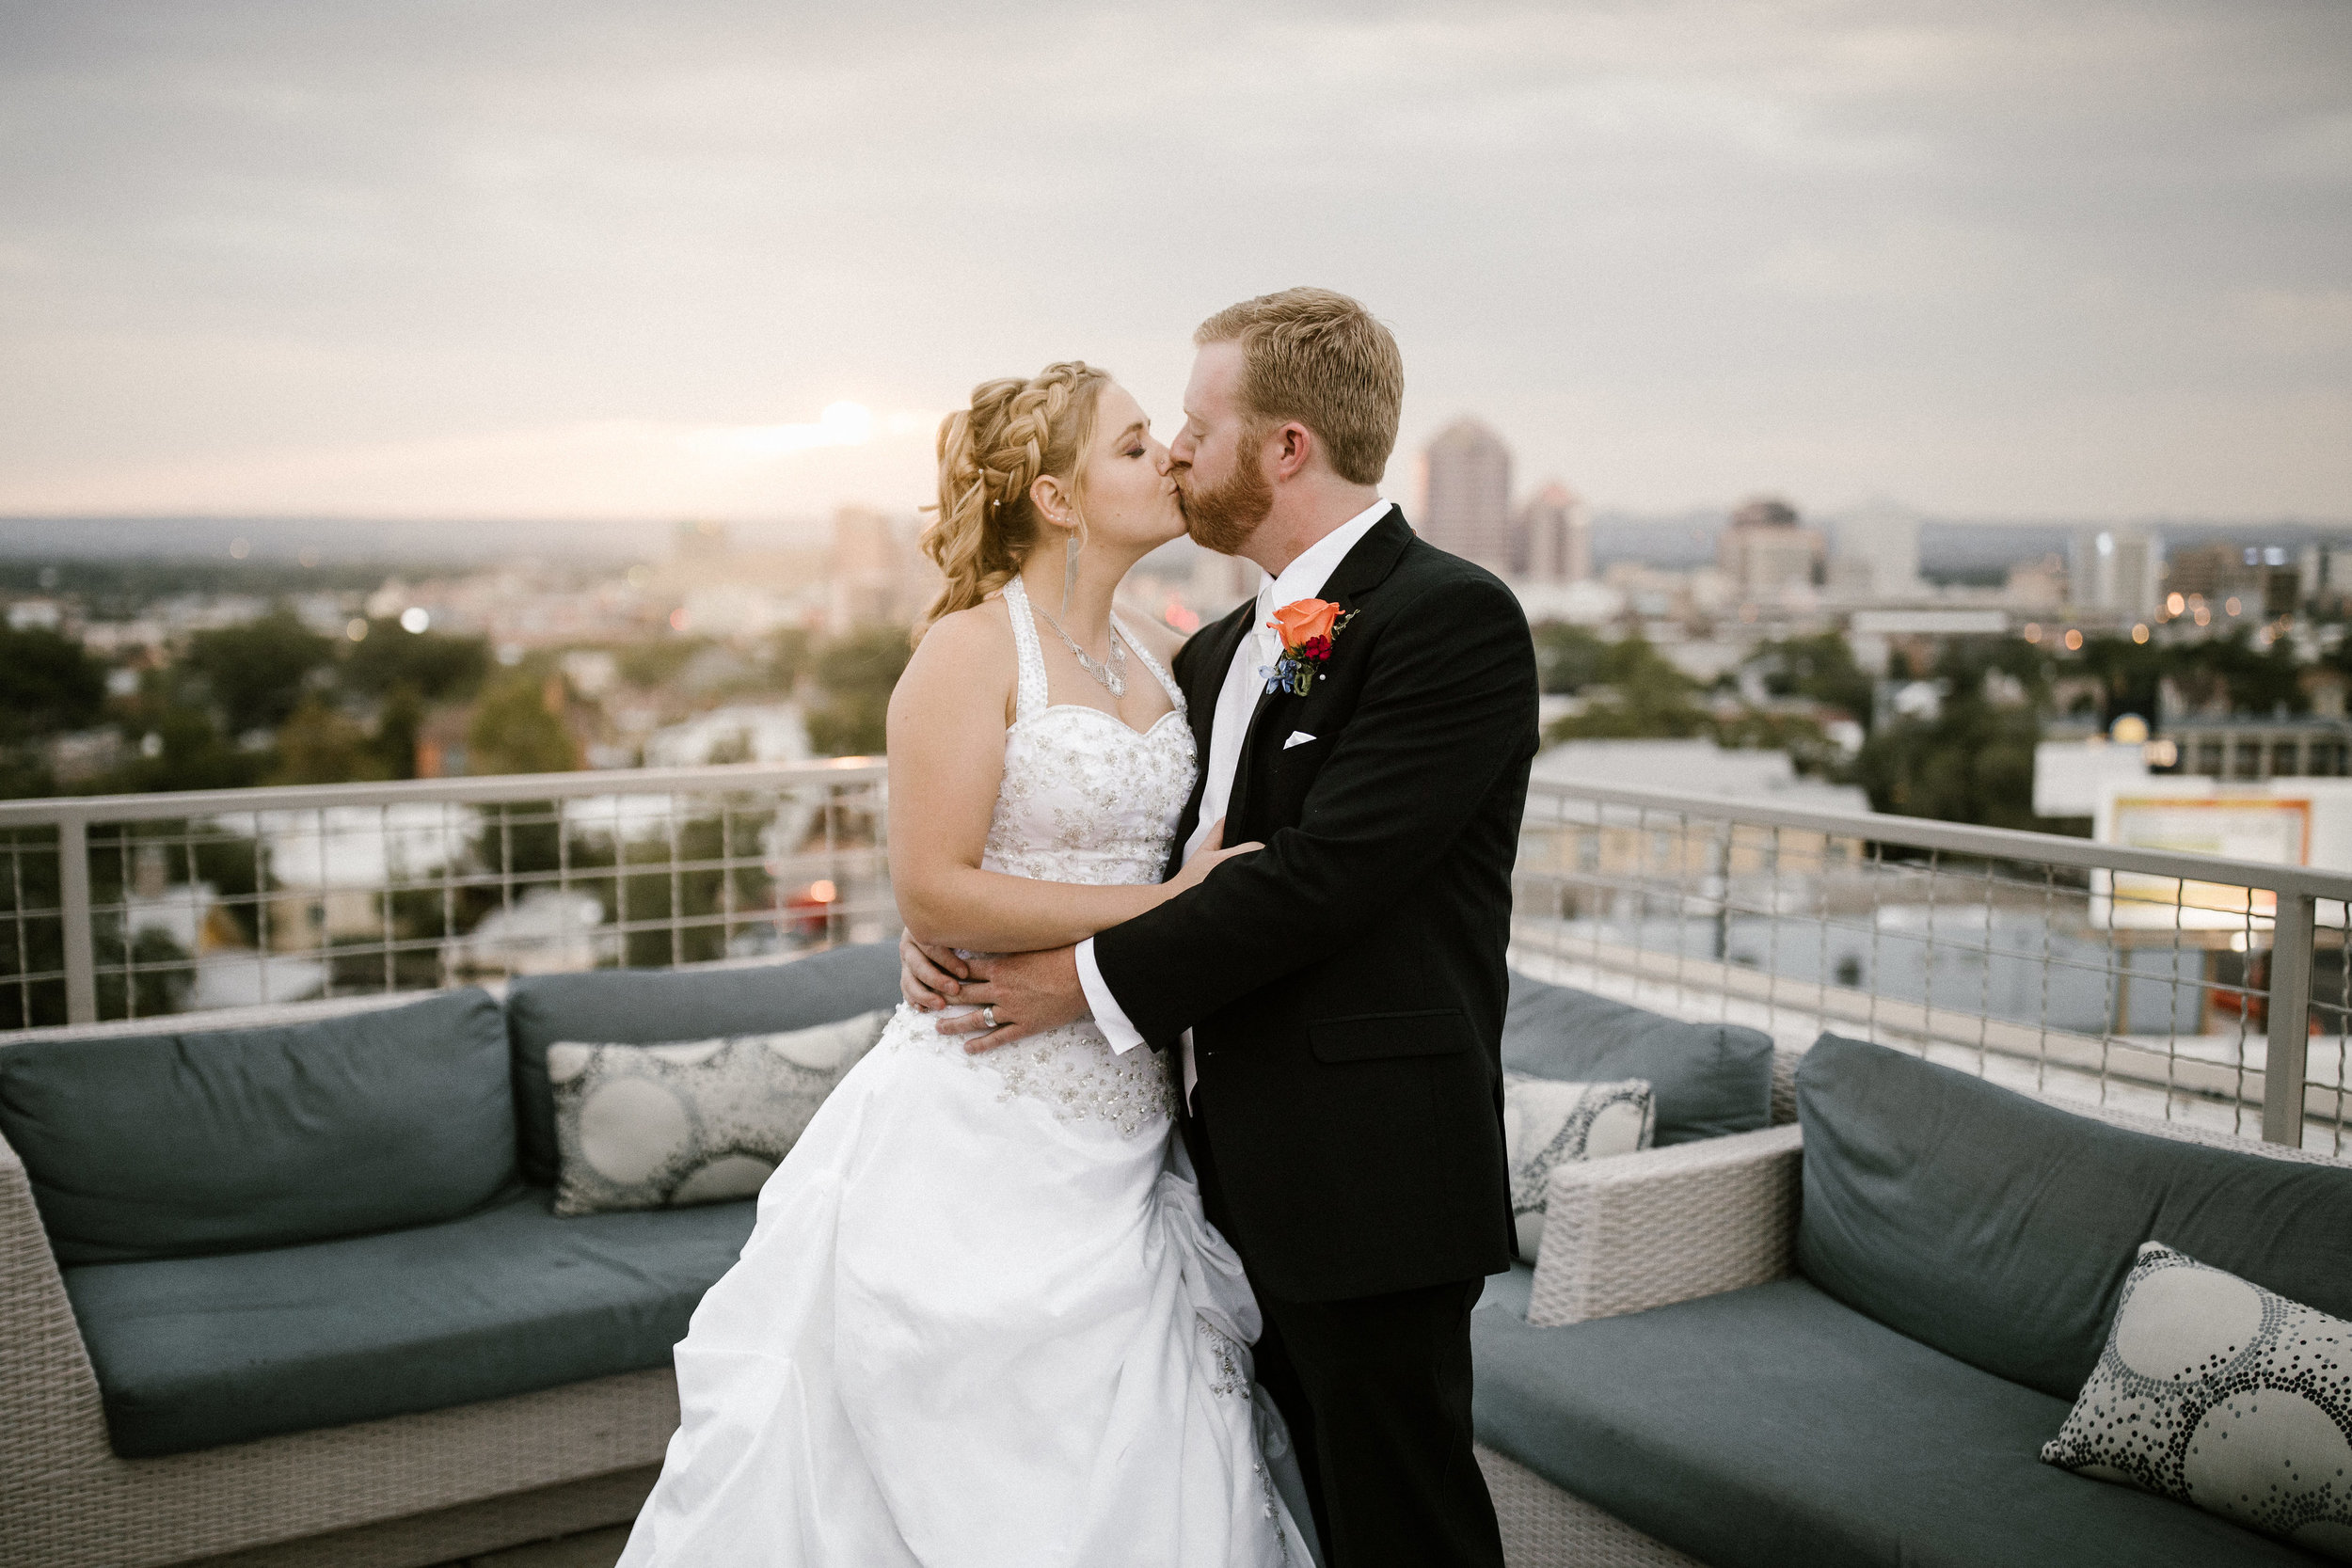 Brey & Ryan | Wedding | Hotel Parq Central